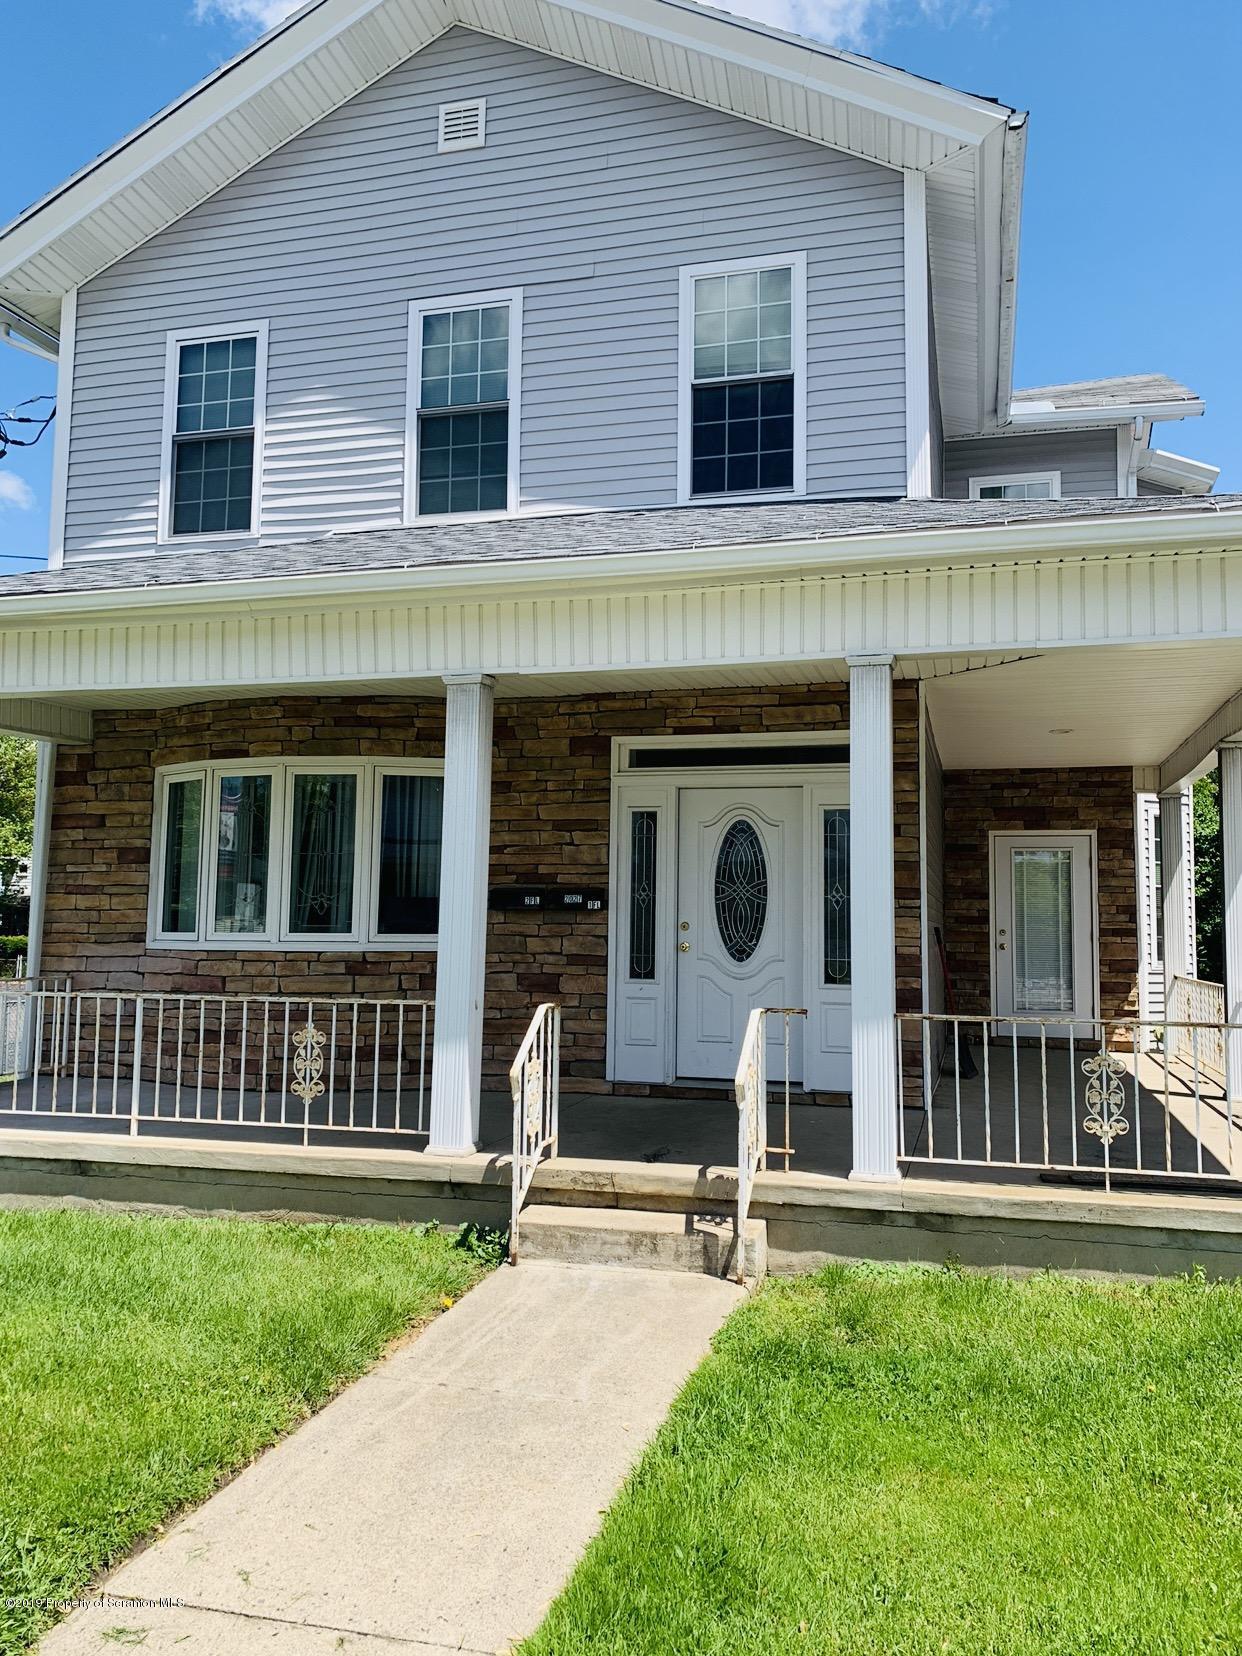 2027 Green Ridge St, Dunmore, Pennsylvania 18512, 2 Bedrooms Bedrooms, 3 Rooms Rooms,1 BathroomBathrooms,Rental,For Lease,Green Ridge,19-2445